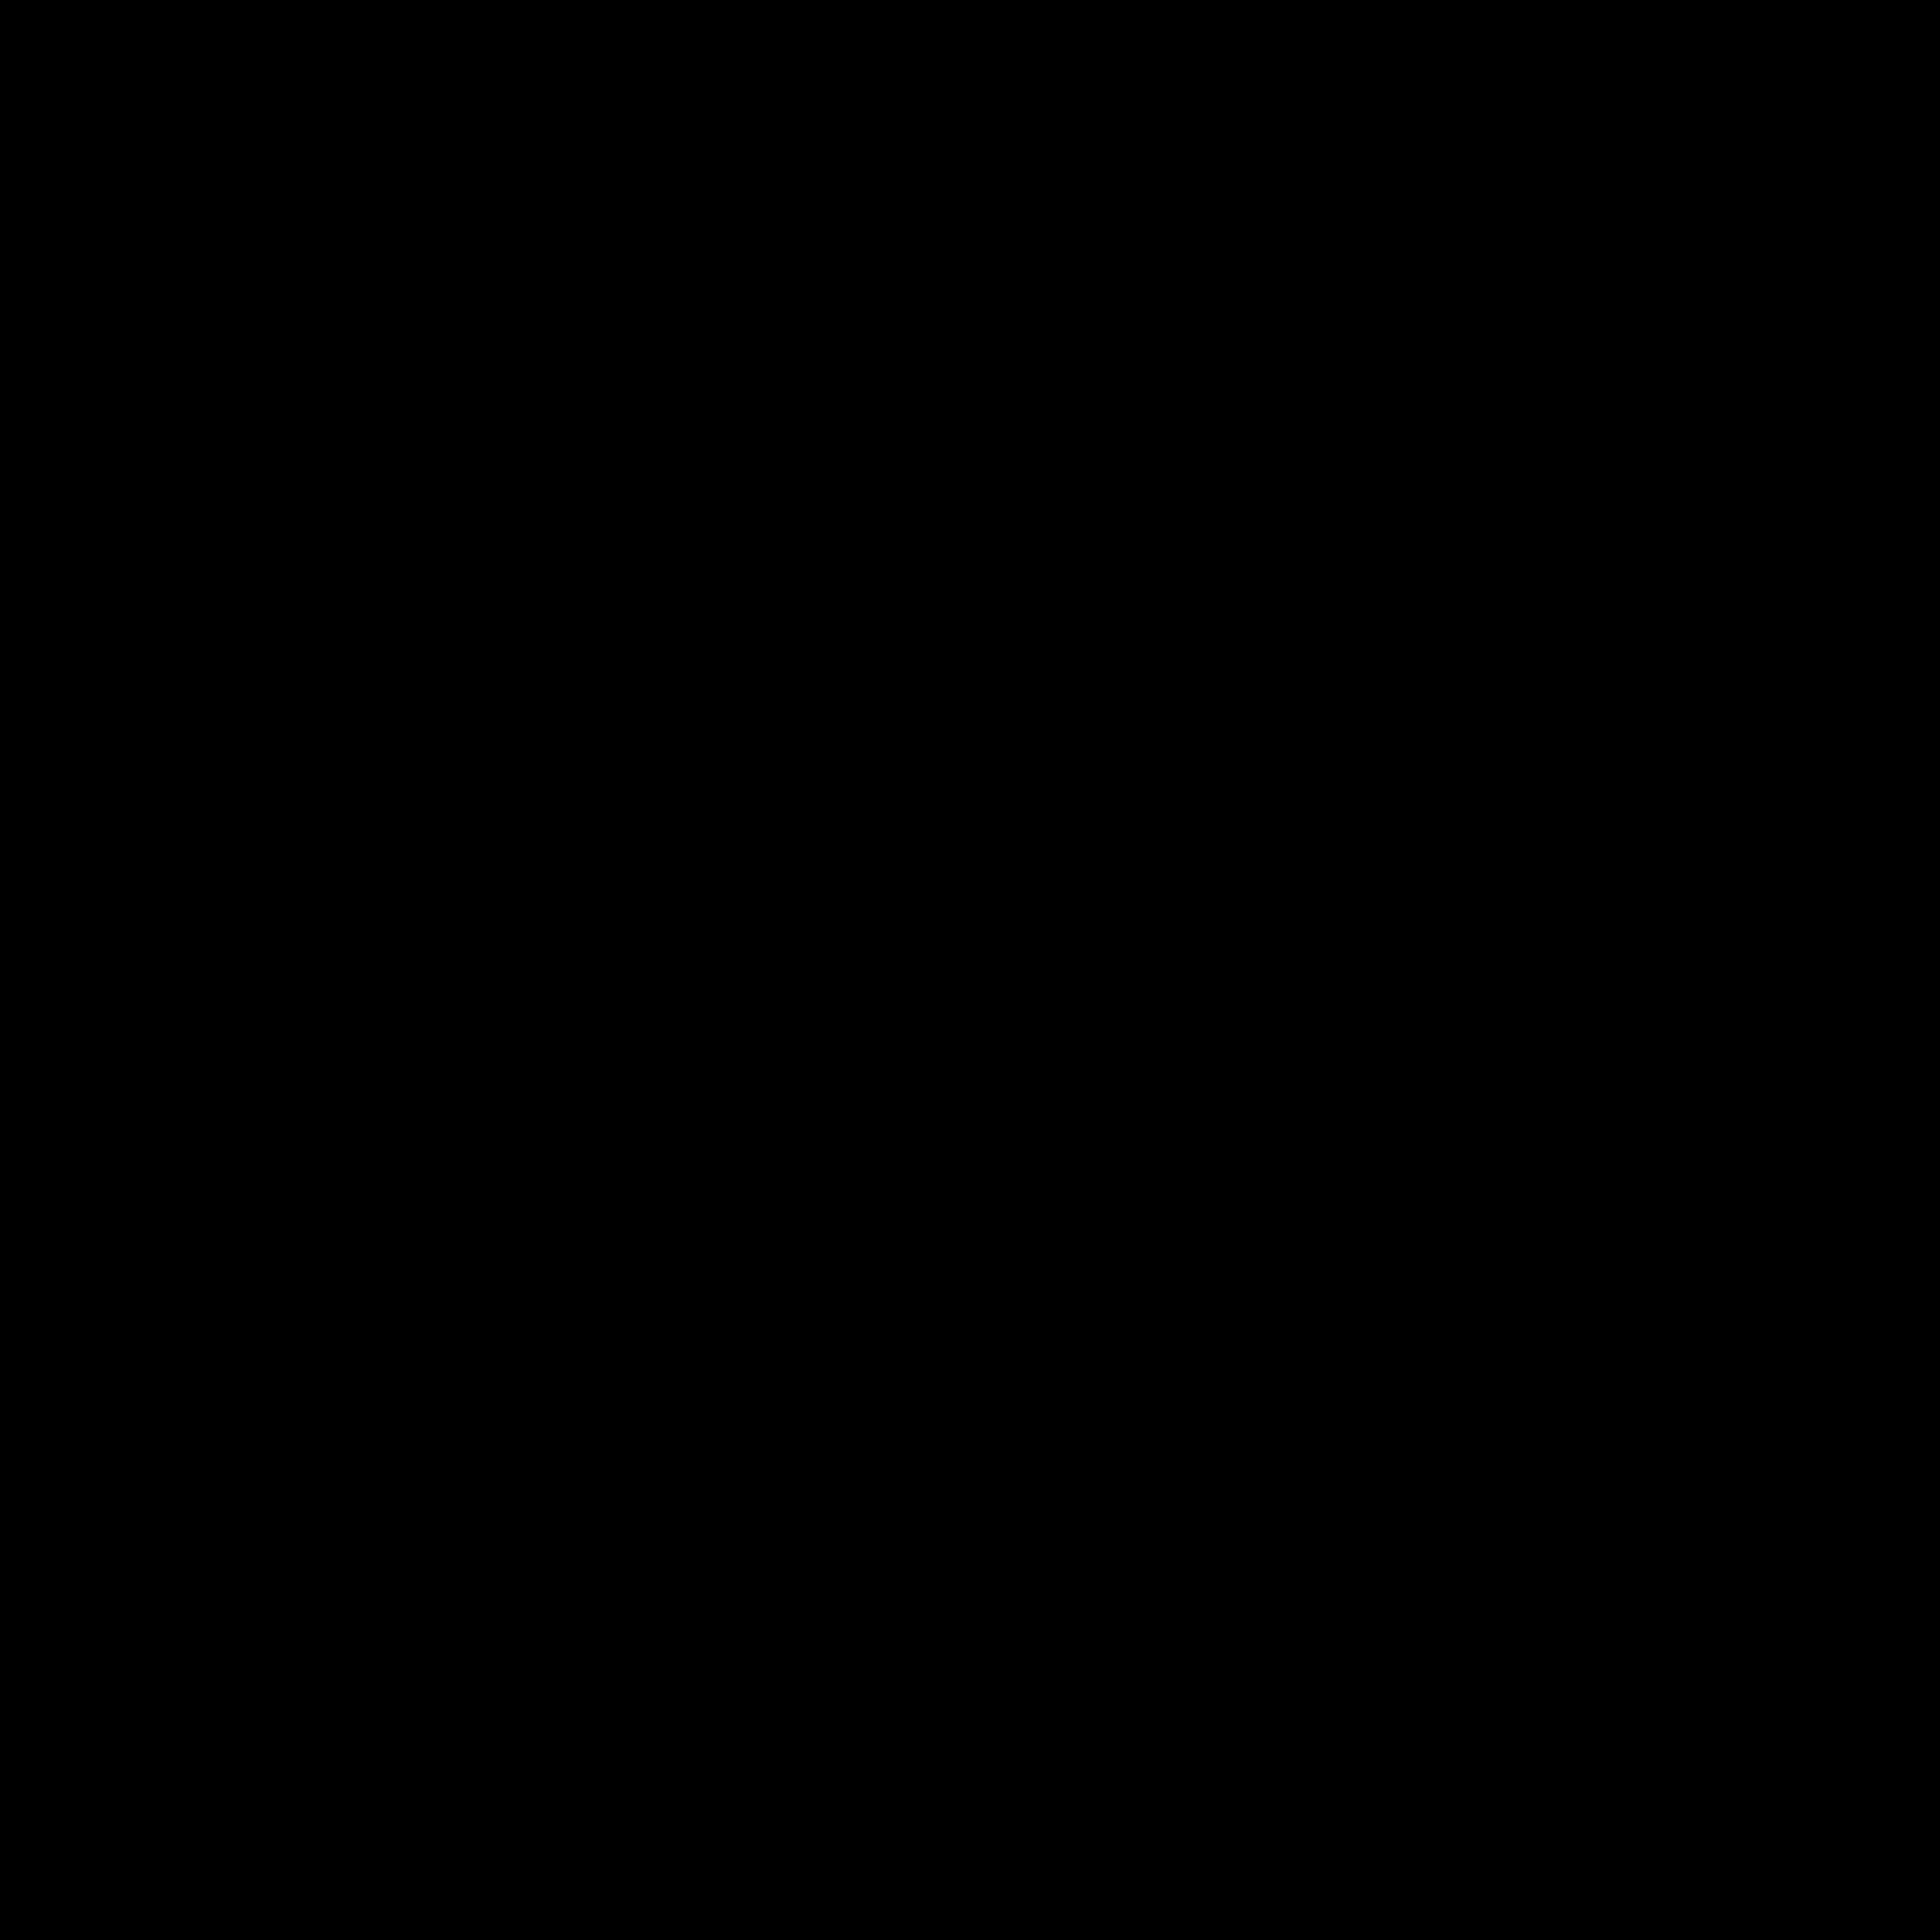 Aj-smärta-illustration-maja-larsson